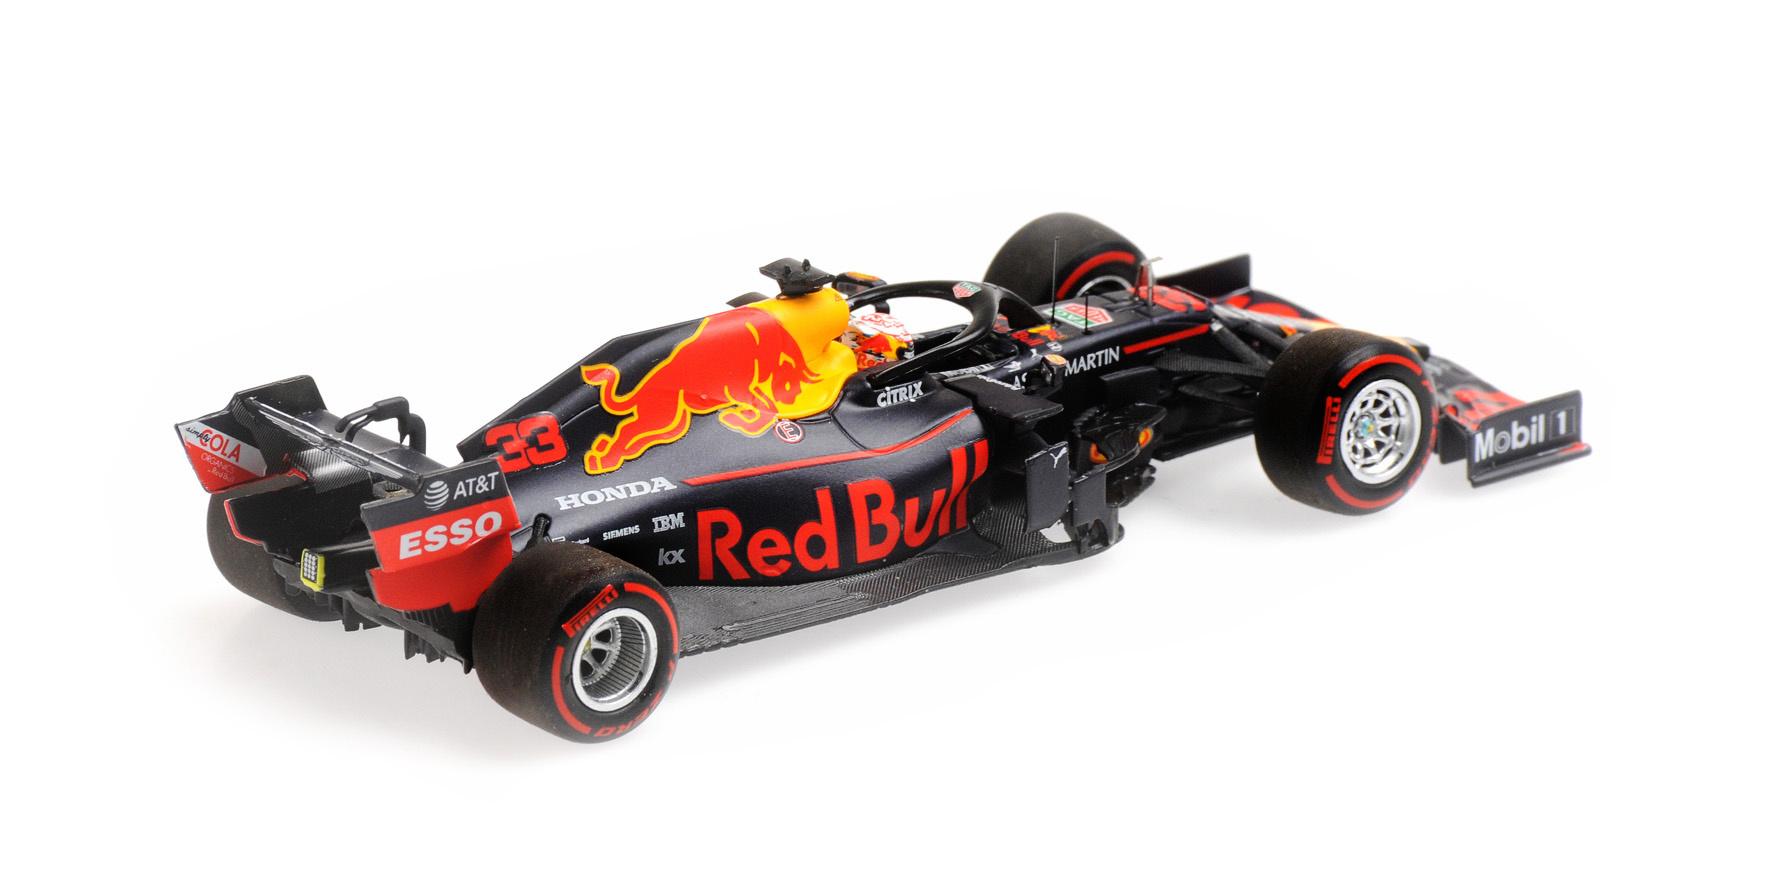 Minichamps Max Verstappen 1:43 modelauto  RB16 2020